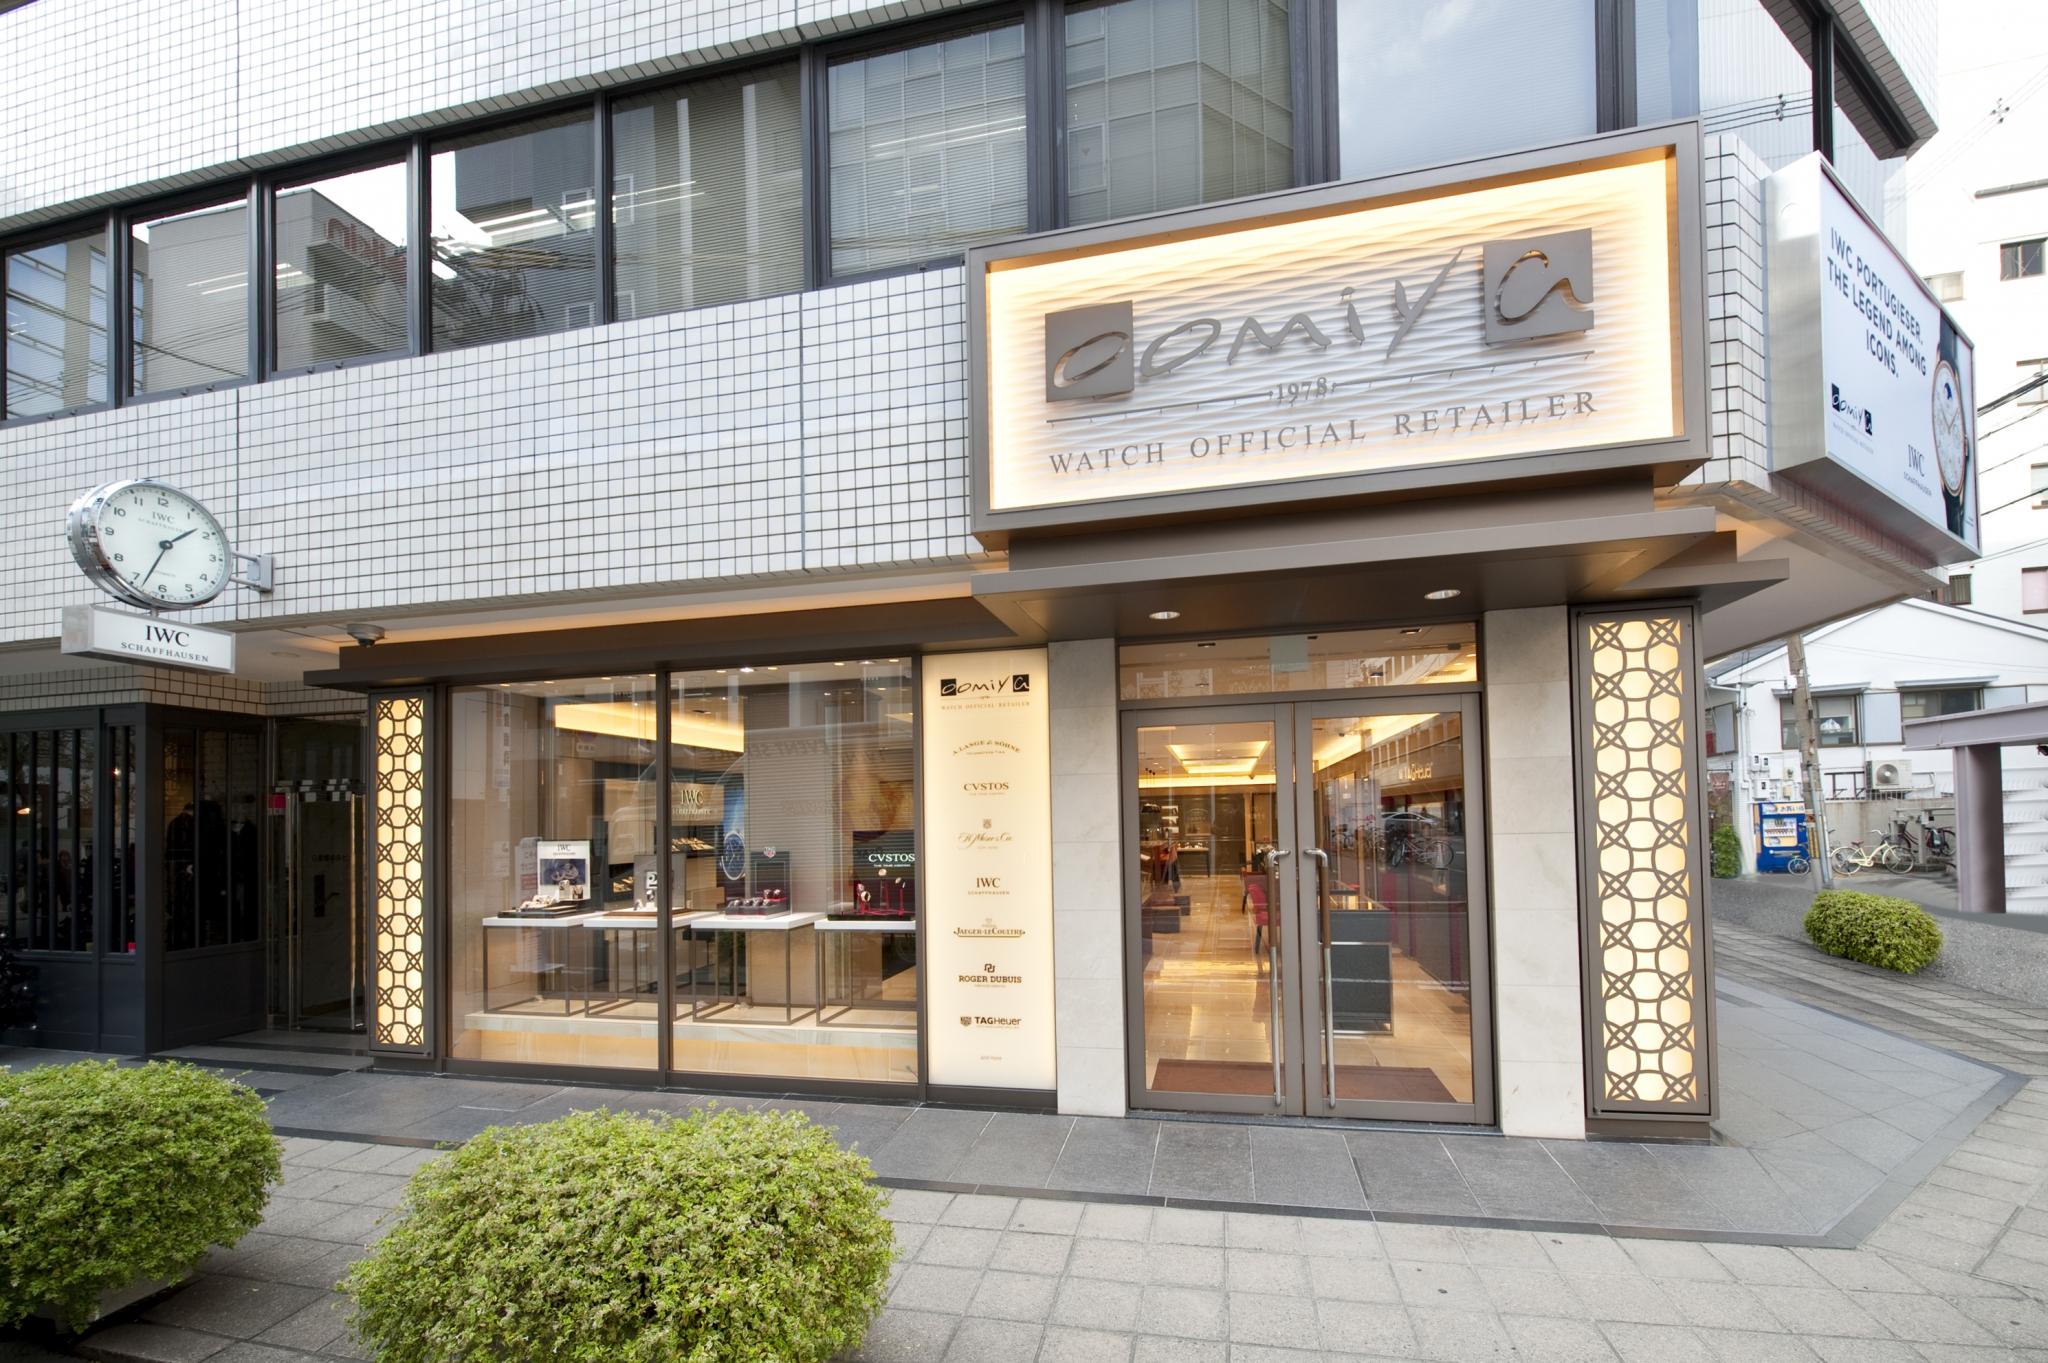 【oomiya大阪心斎橋店からお知らせ】今週の水曜日、3月21日は臨時営業いたします。